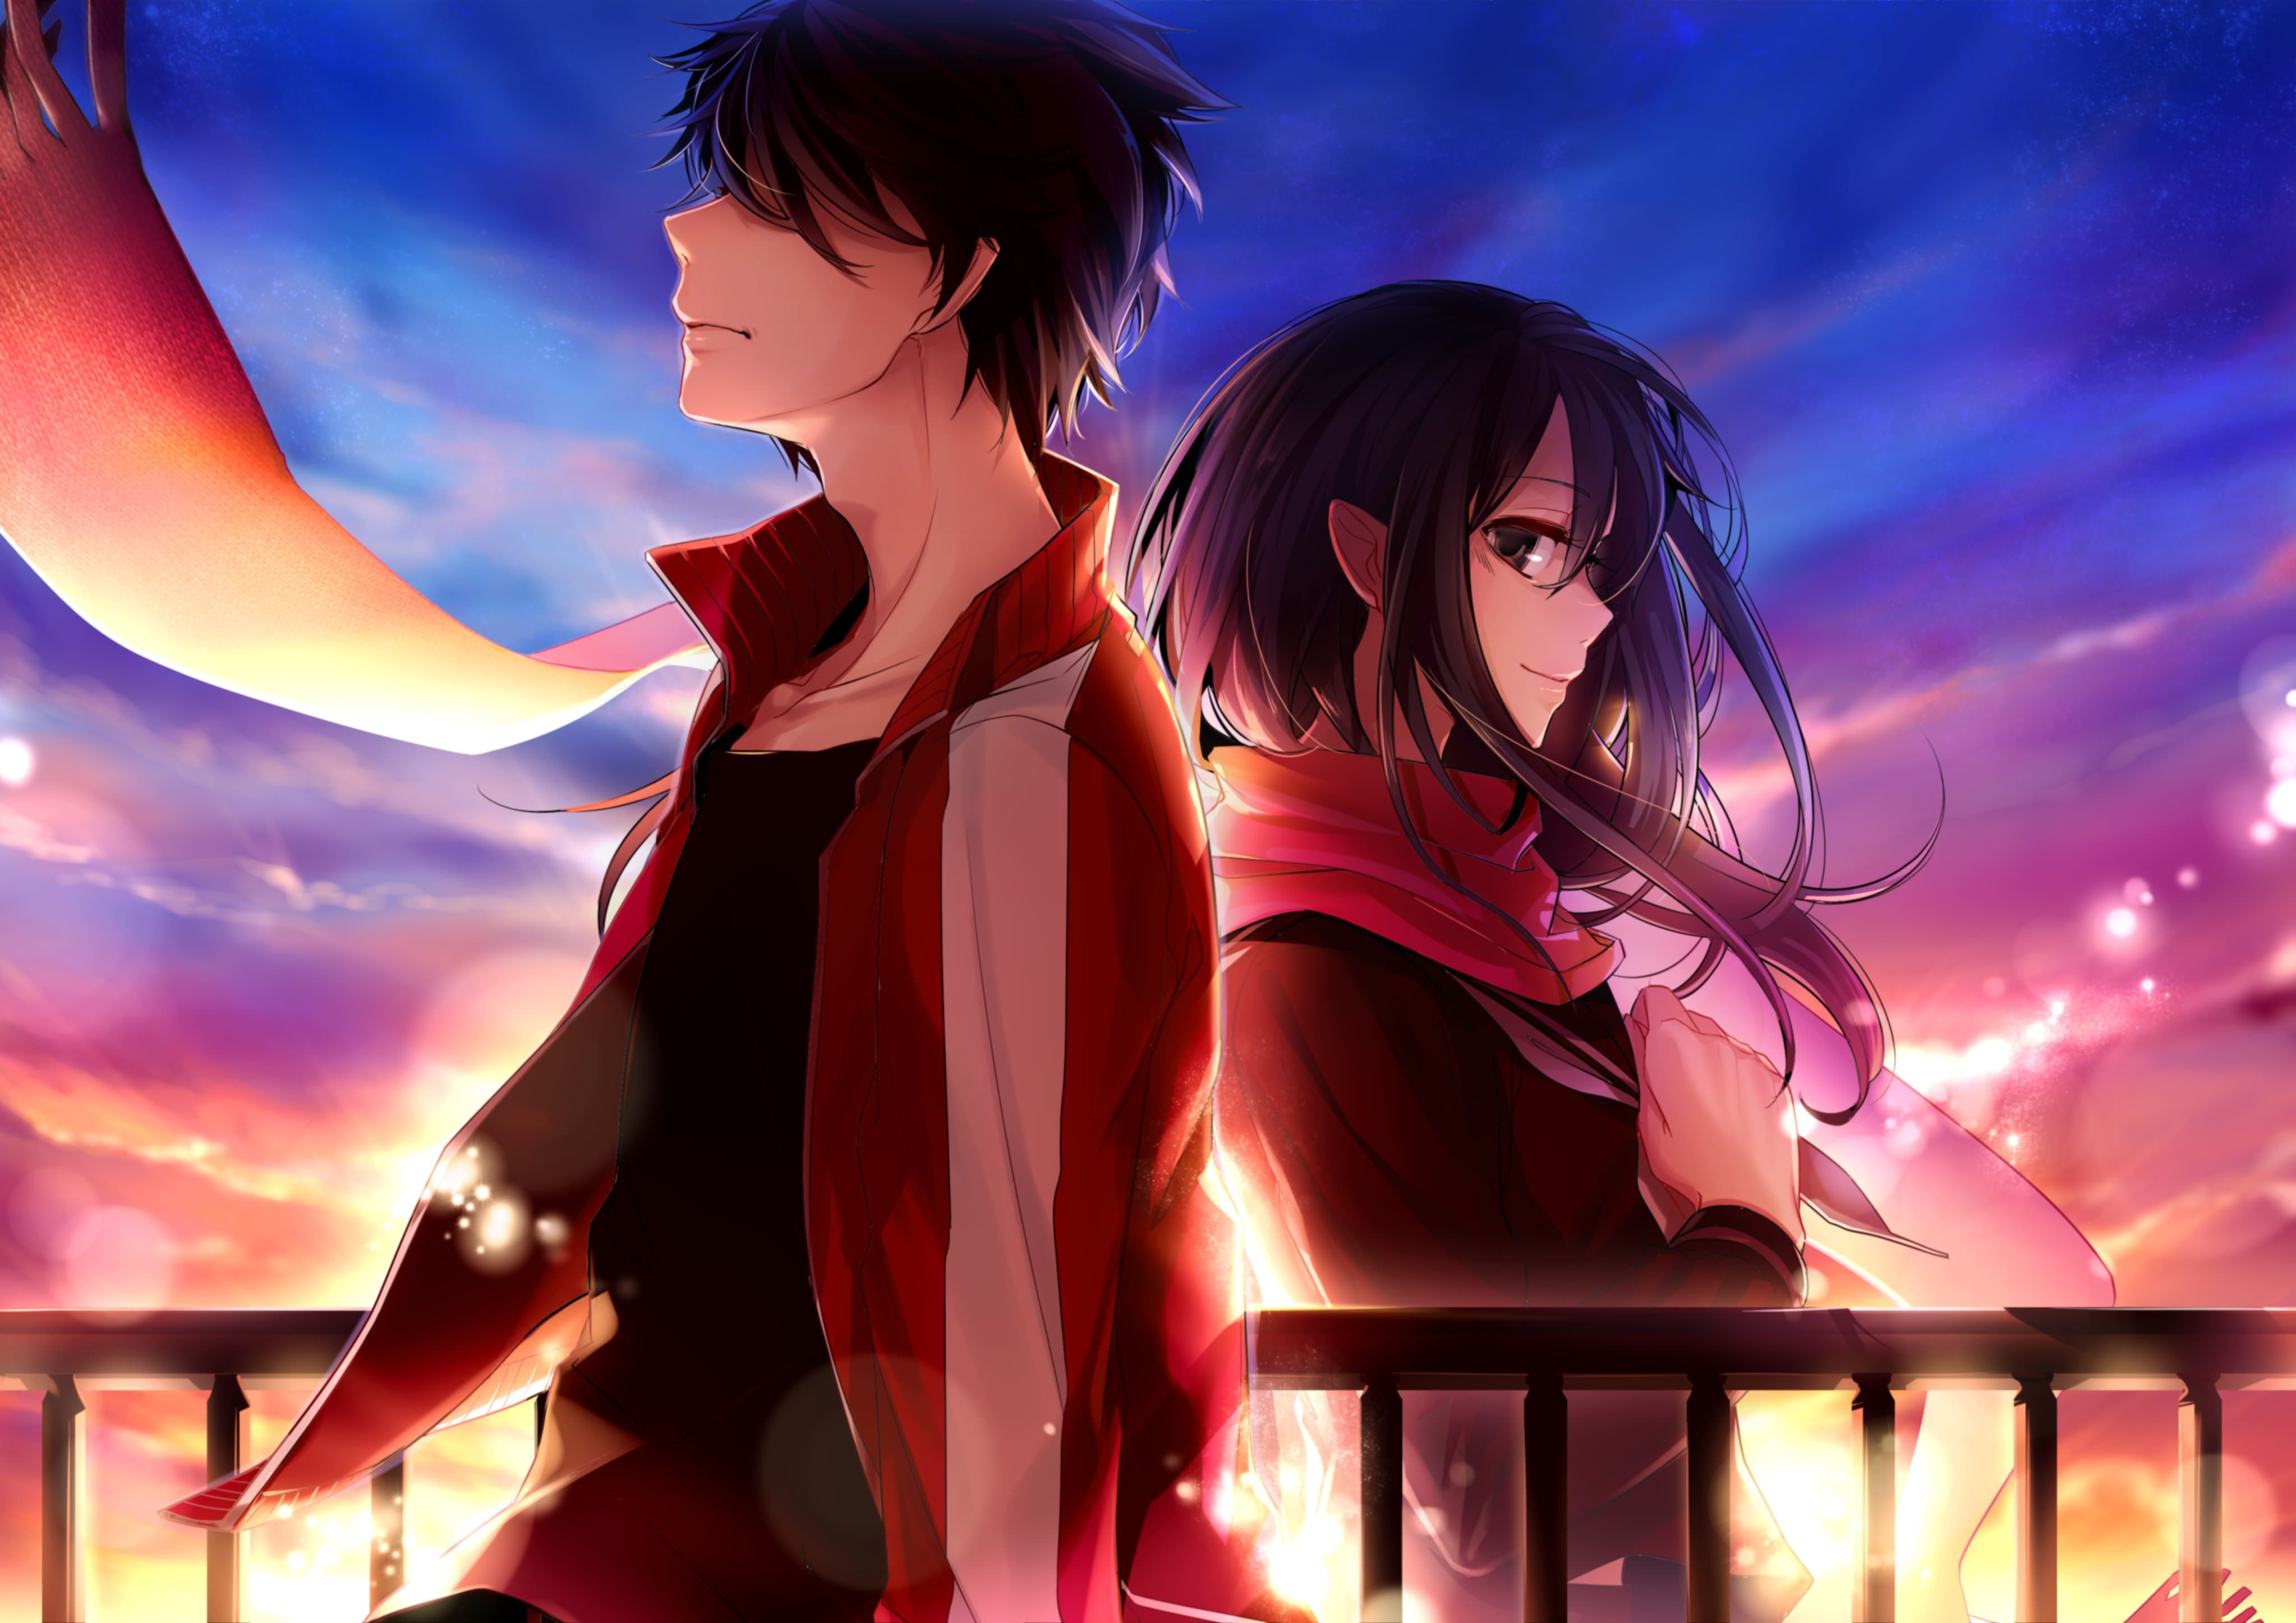 Ayano Tateyama and Shintaro Kisaragi Animasi, Gadis